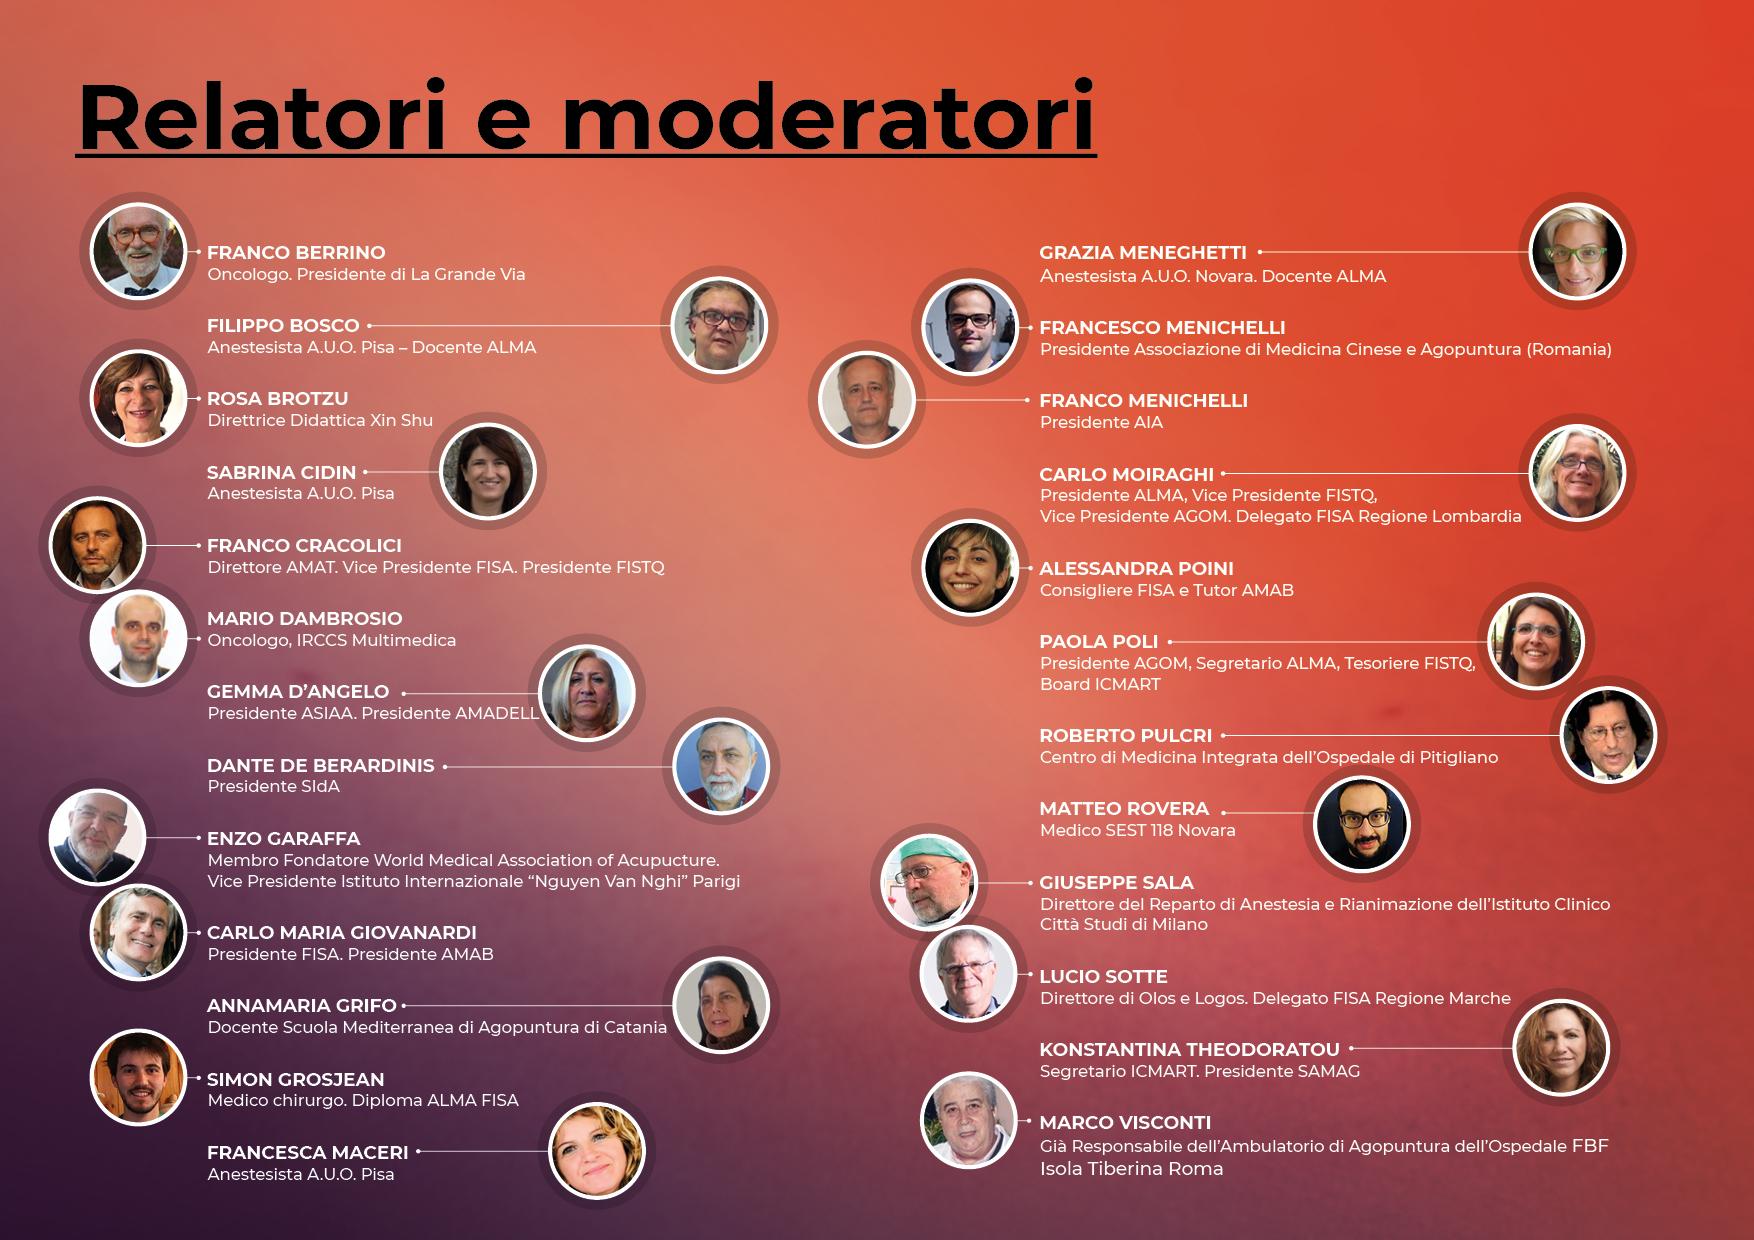 webinar-relatori